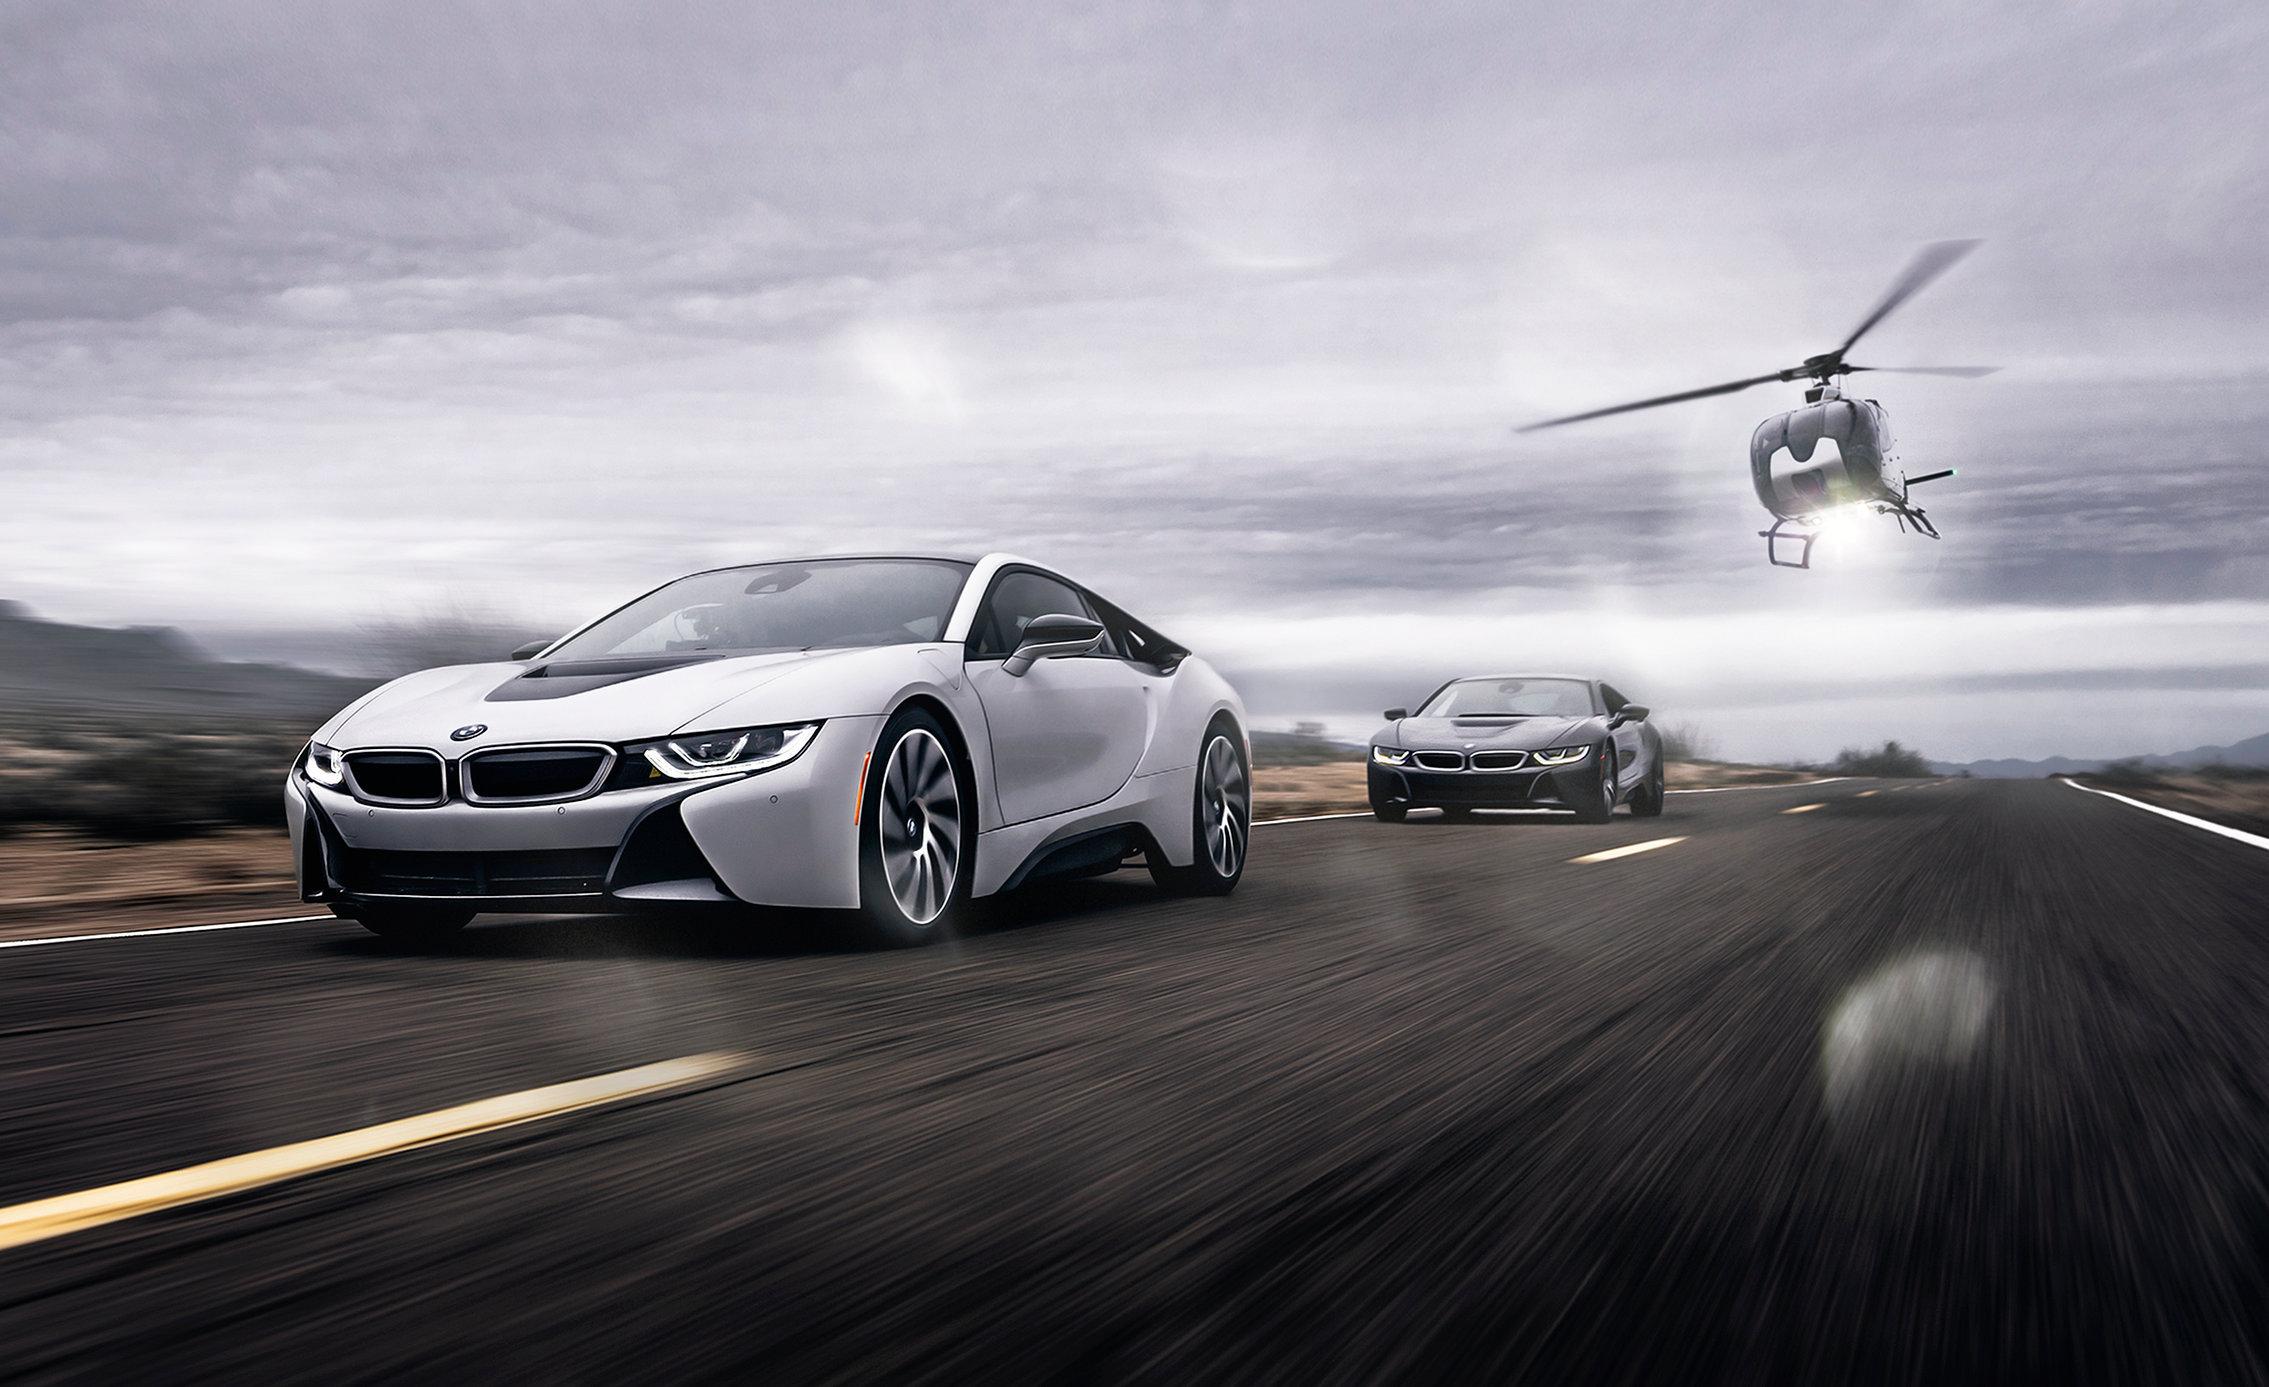 BMW CES heilcopter chase FINAL FINAL PORT FINAL.jpg